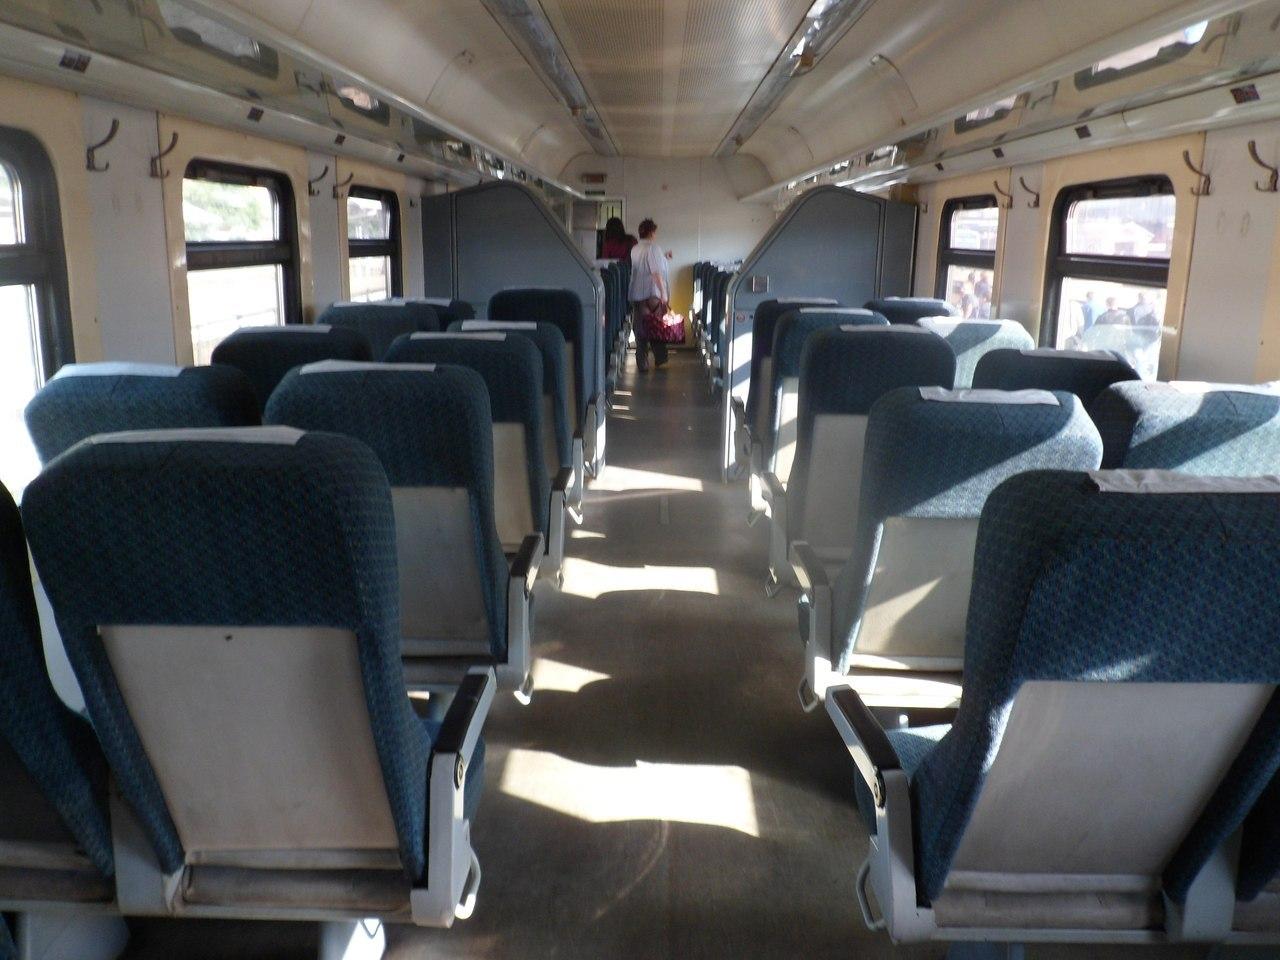 Схема сидячего вагона москва-брянск